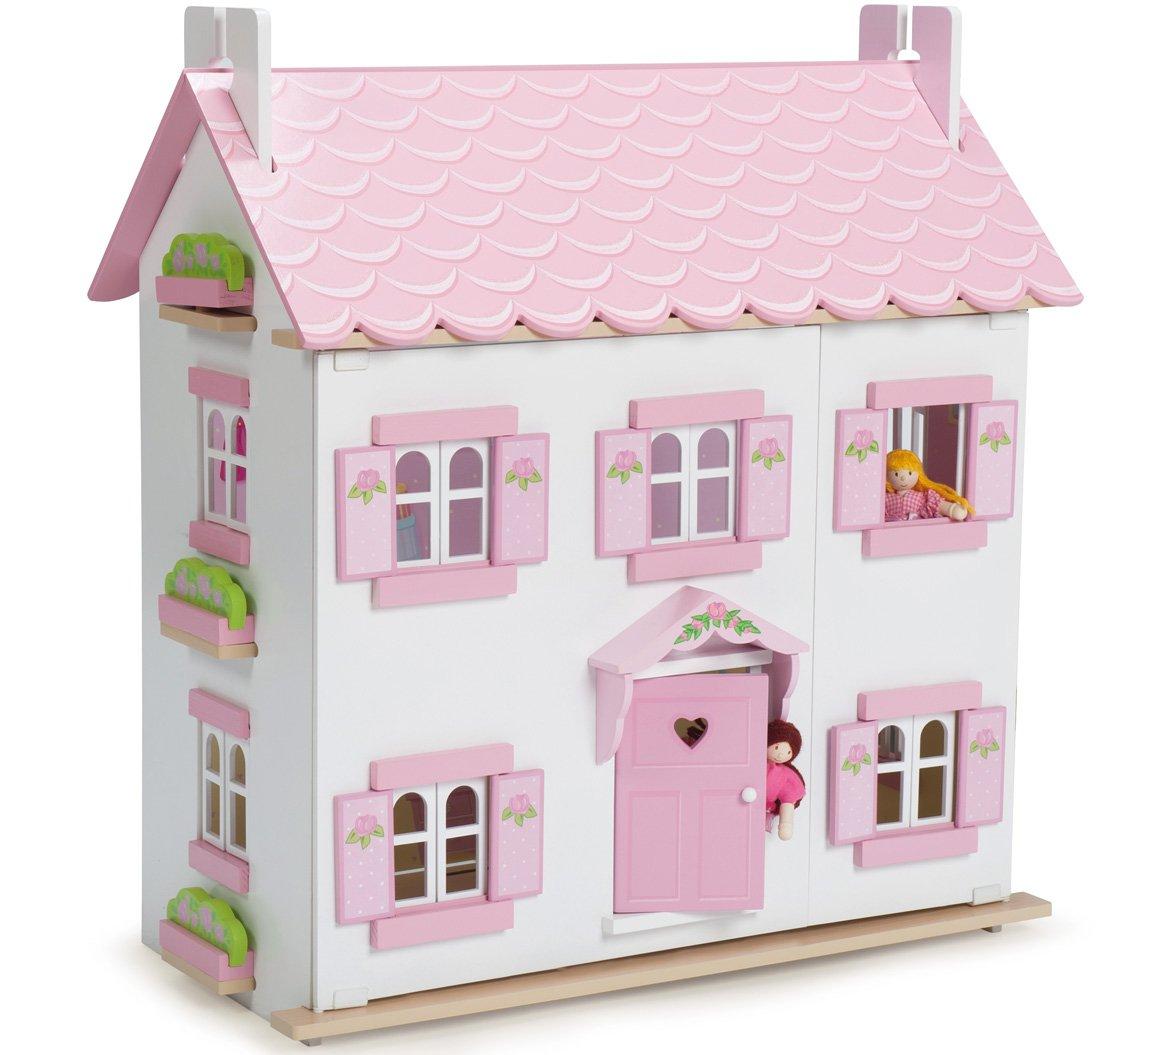 Le Toy Van Sophie's House Wooden Dolls House